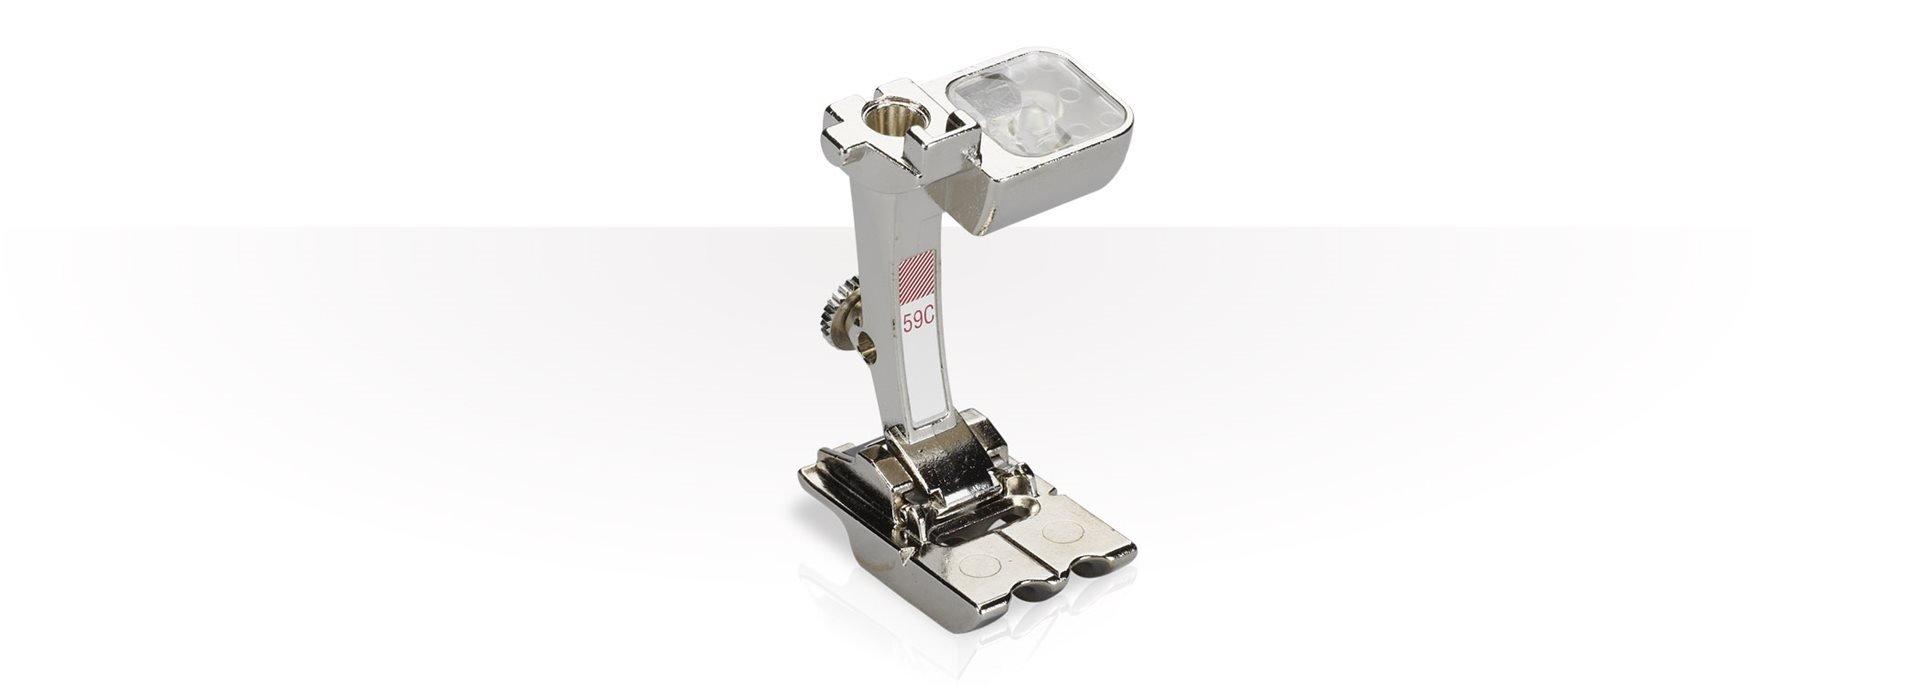 #59C Double Cording Piping Foot | 4-6mm Diameter Cord | Bernina White Card